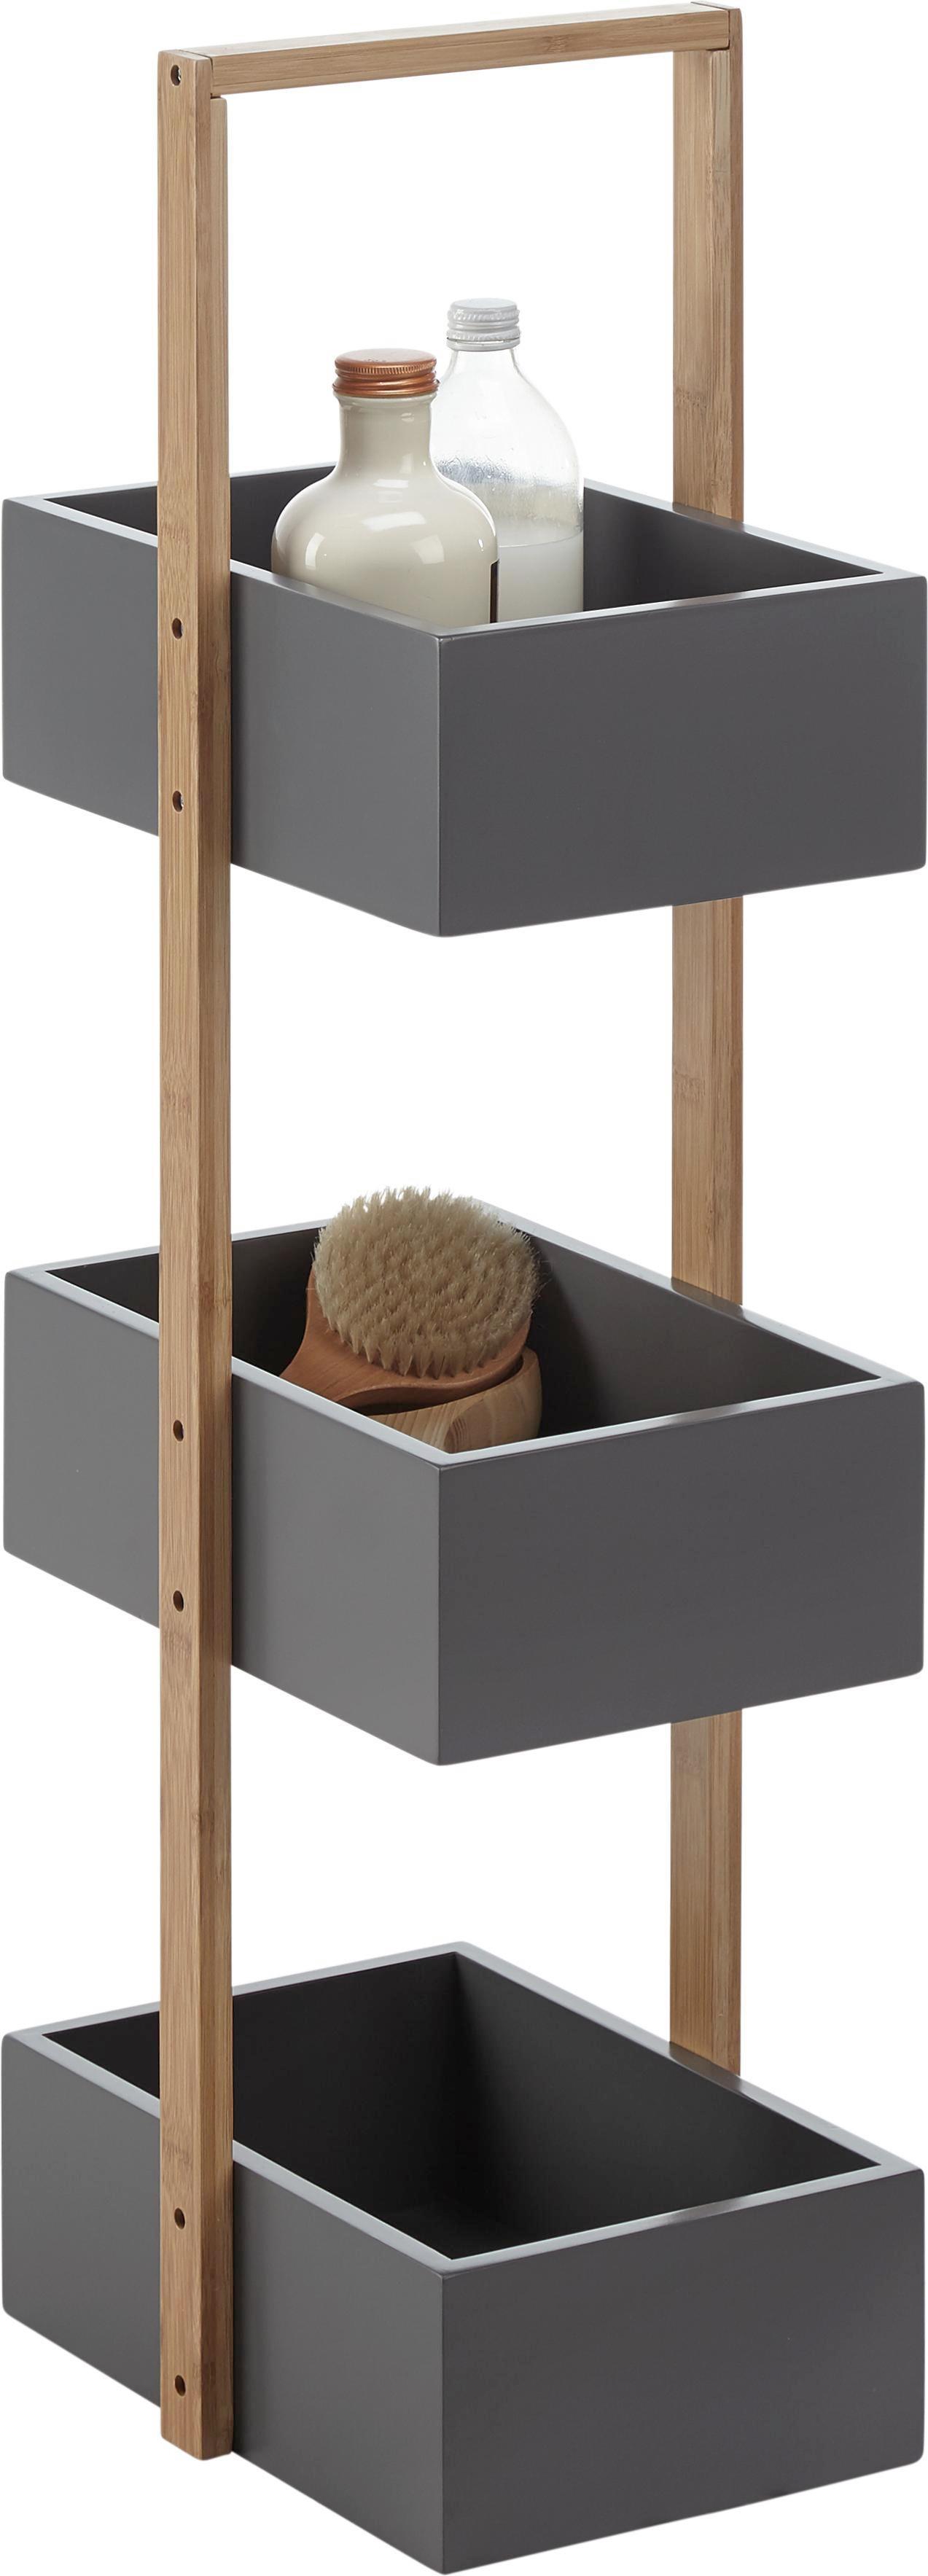 Badezimmerregal Mirella online kaufen ➤ mömax | {Badezimmerregal 30}